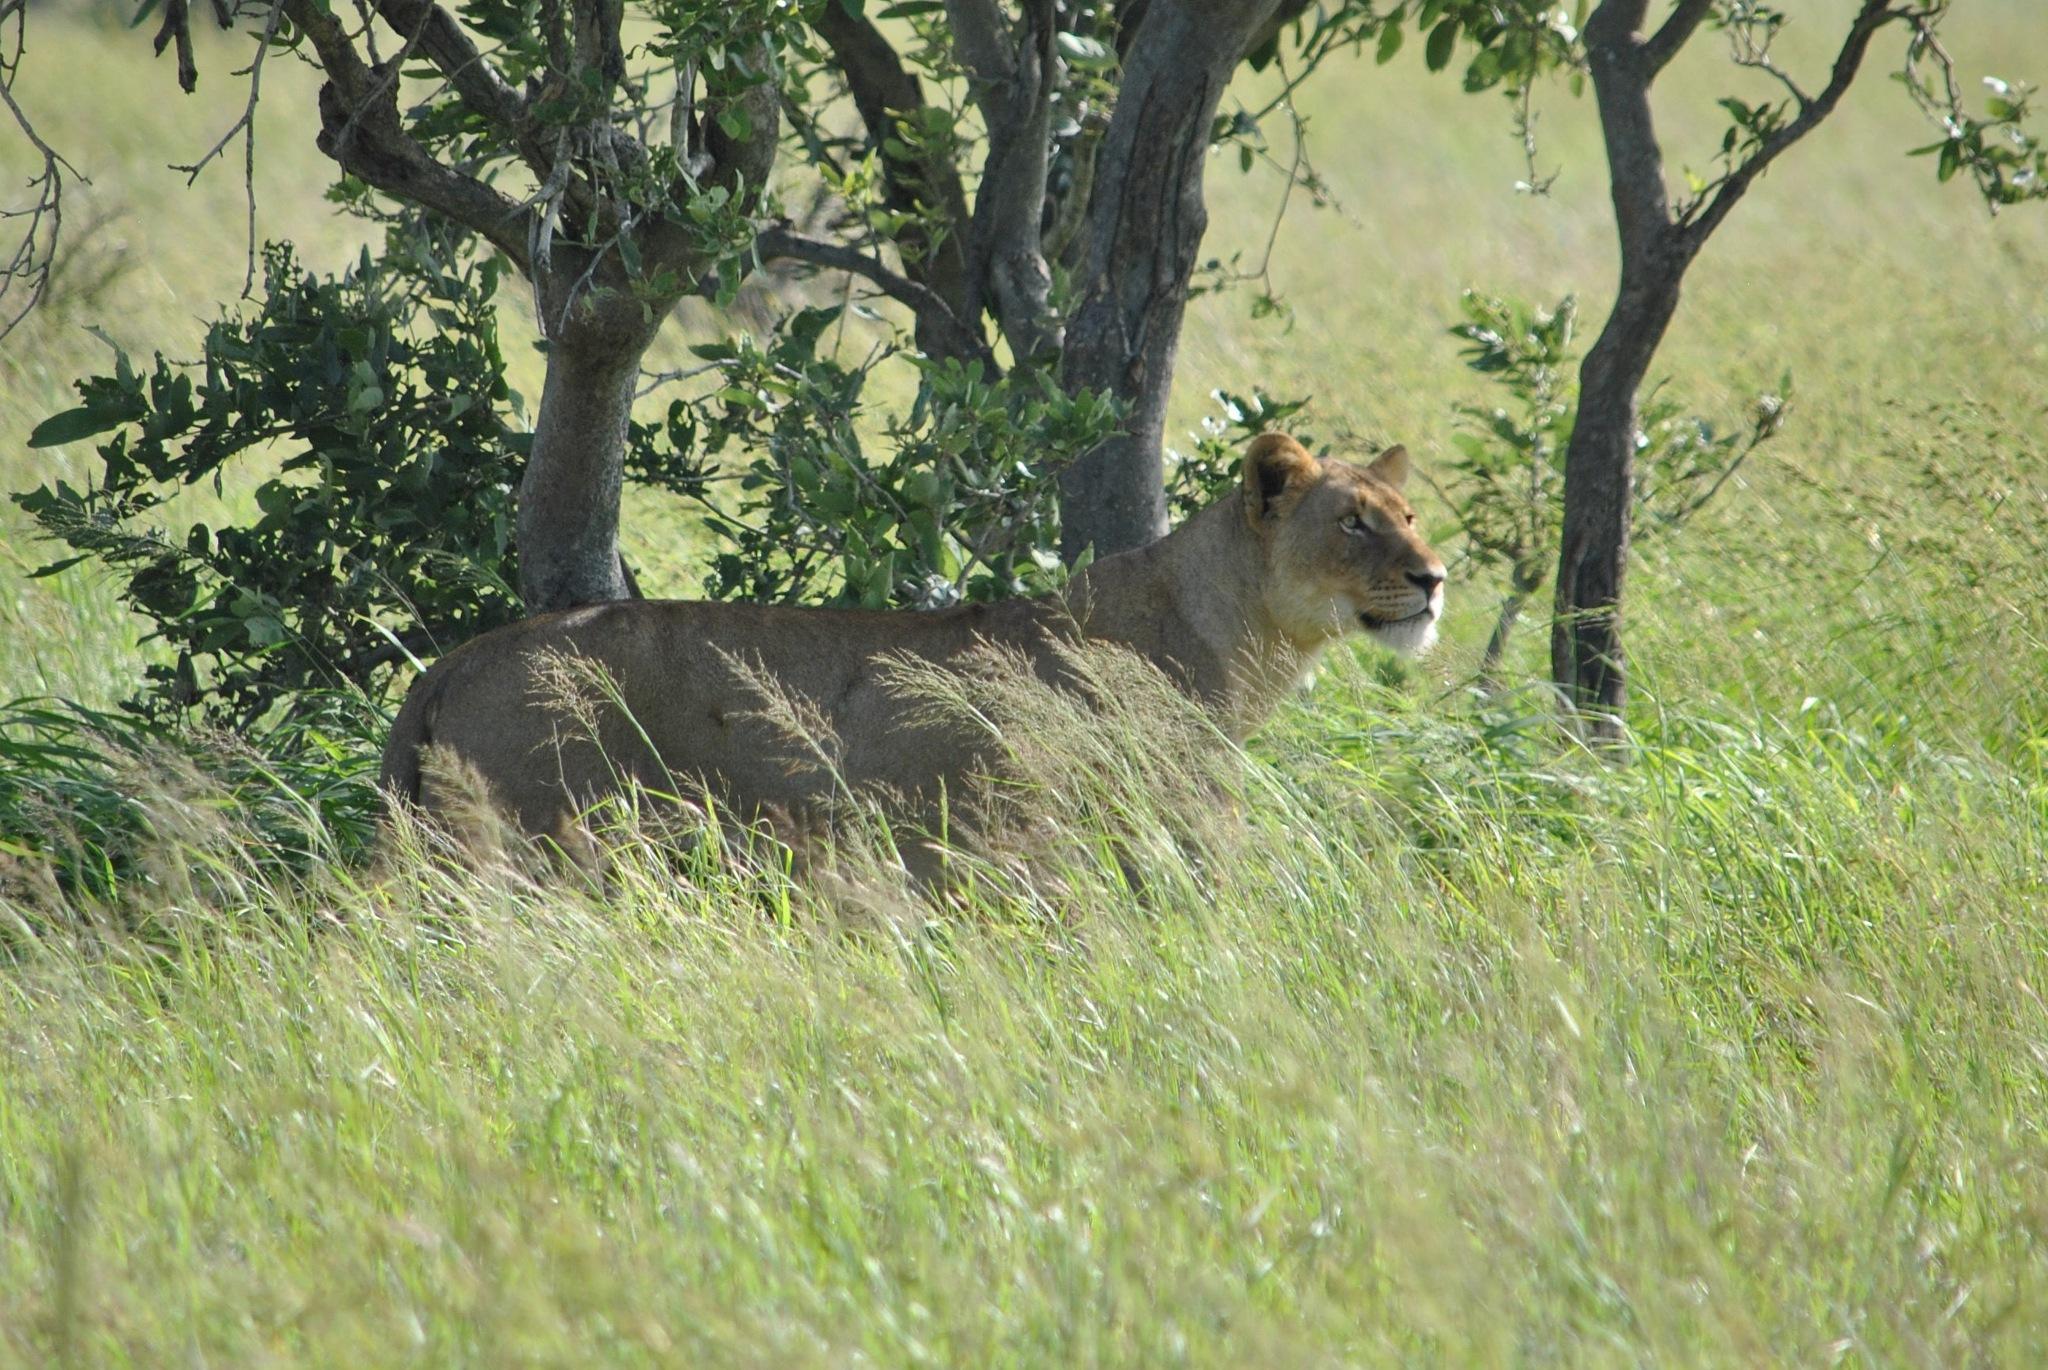 Lioness by godfreyanker